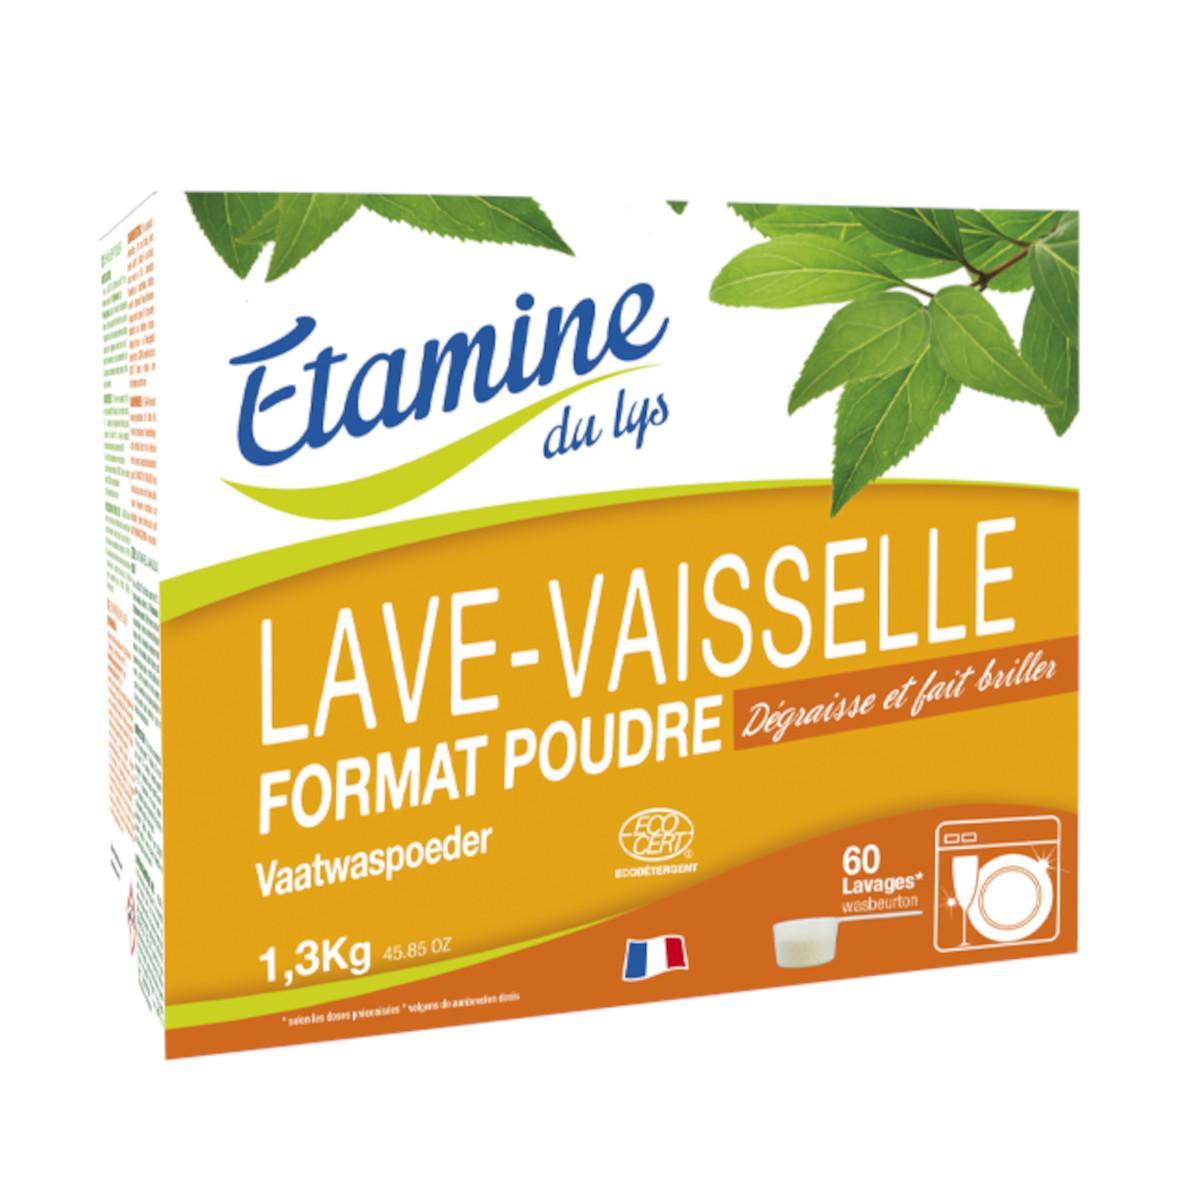 Etamine du Lys Prášek do myčky 1,3 Kg